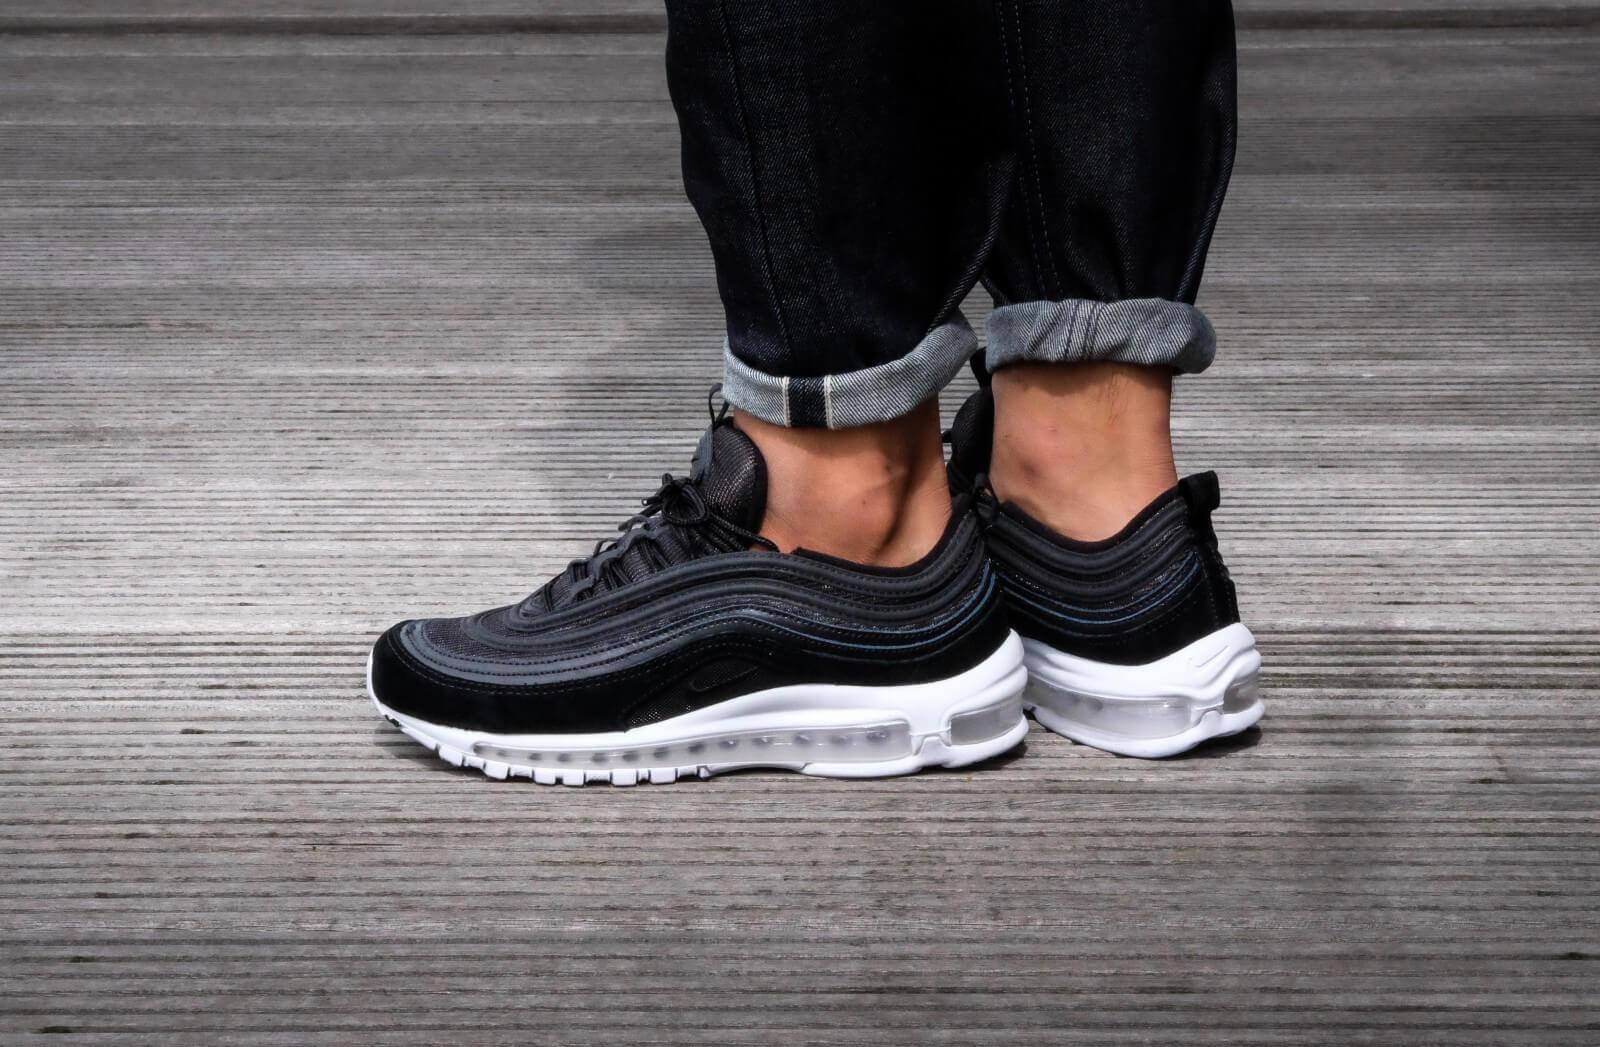 Nike Air Max 97 Black White 921826 003